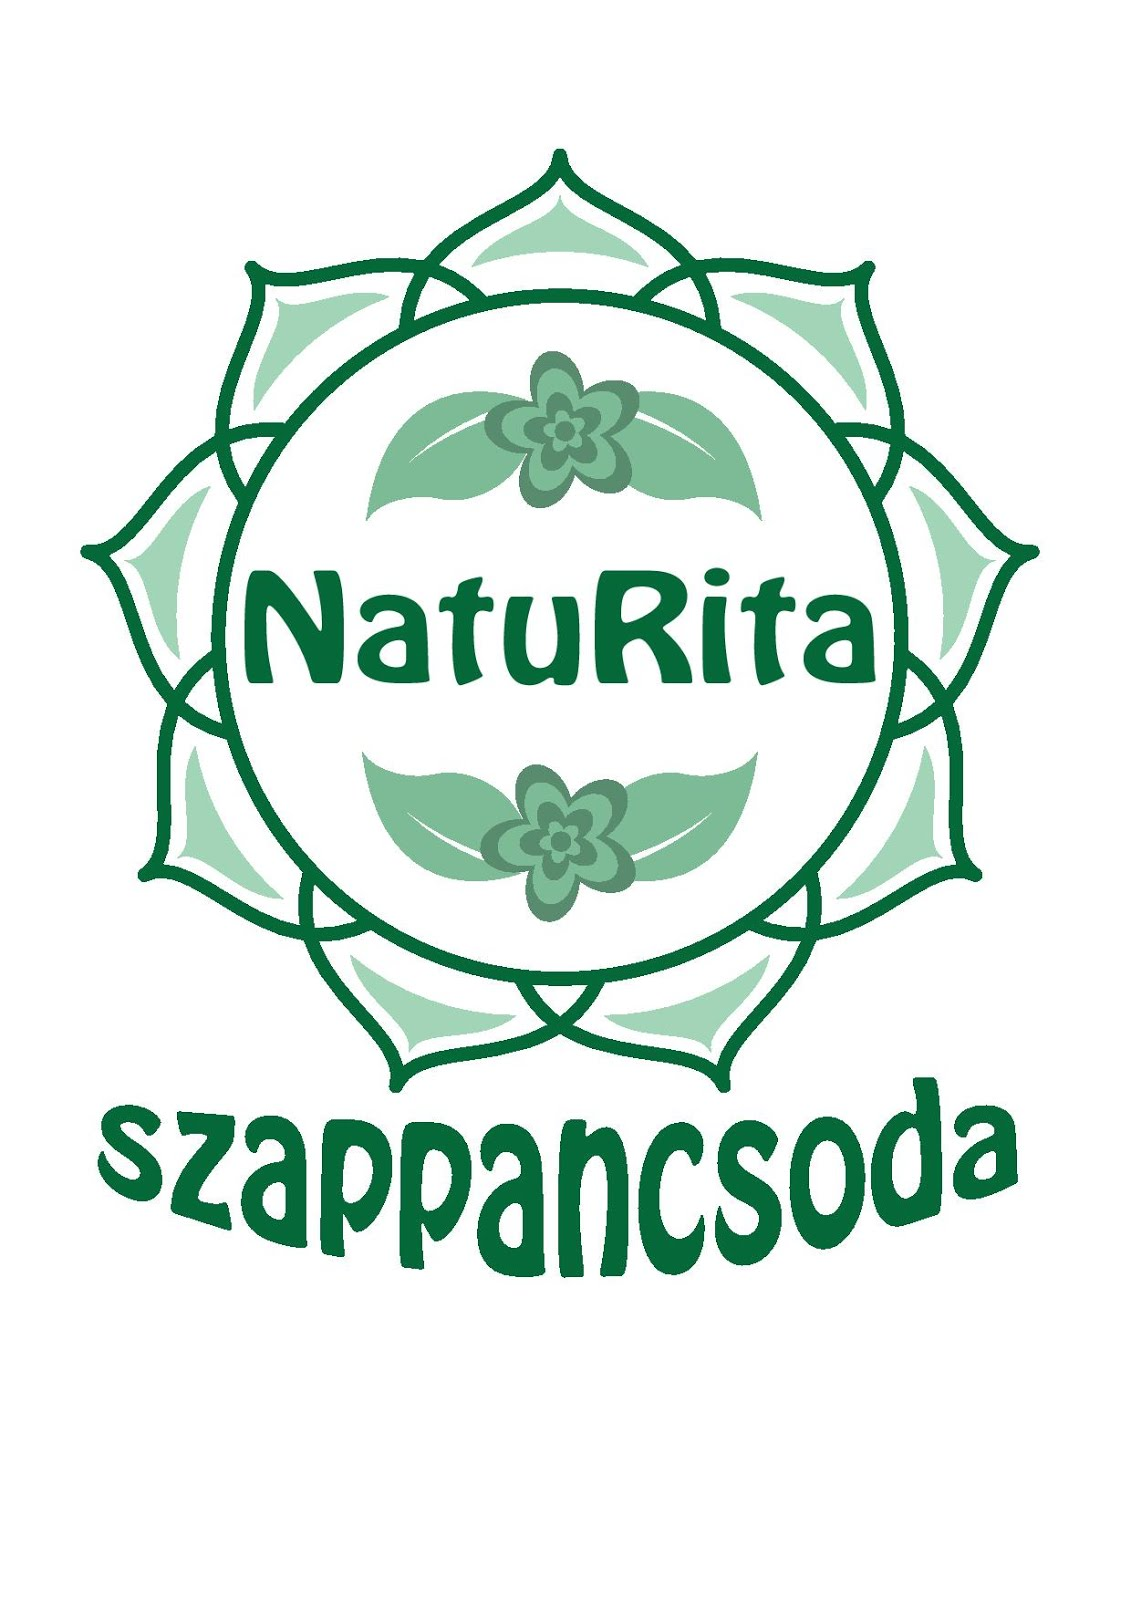 NatuRita szappancsoda